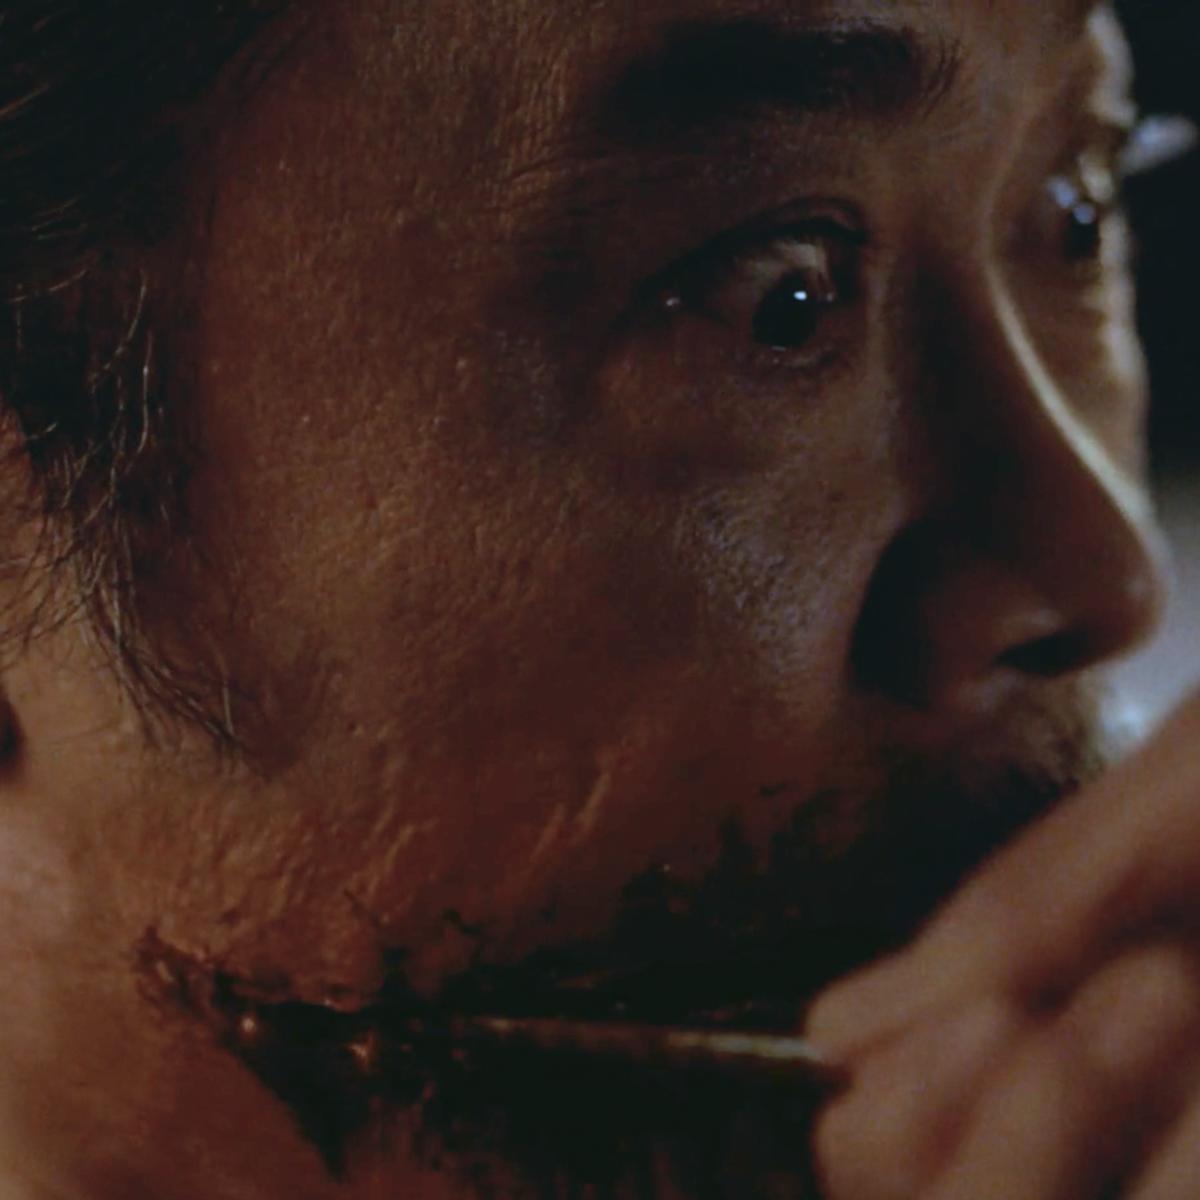 Shogun from Westworld Season 2